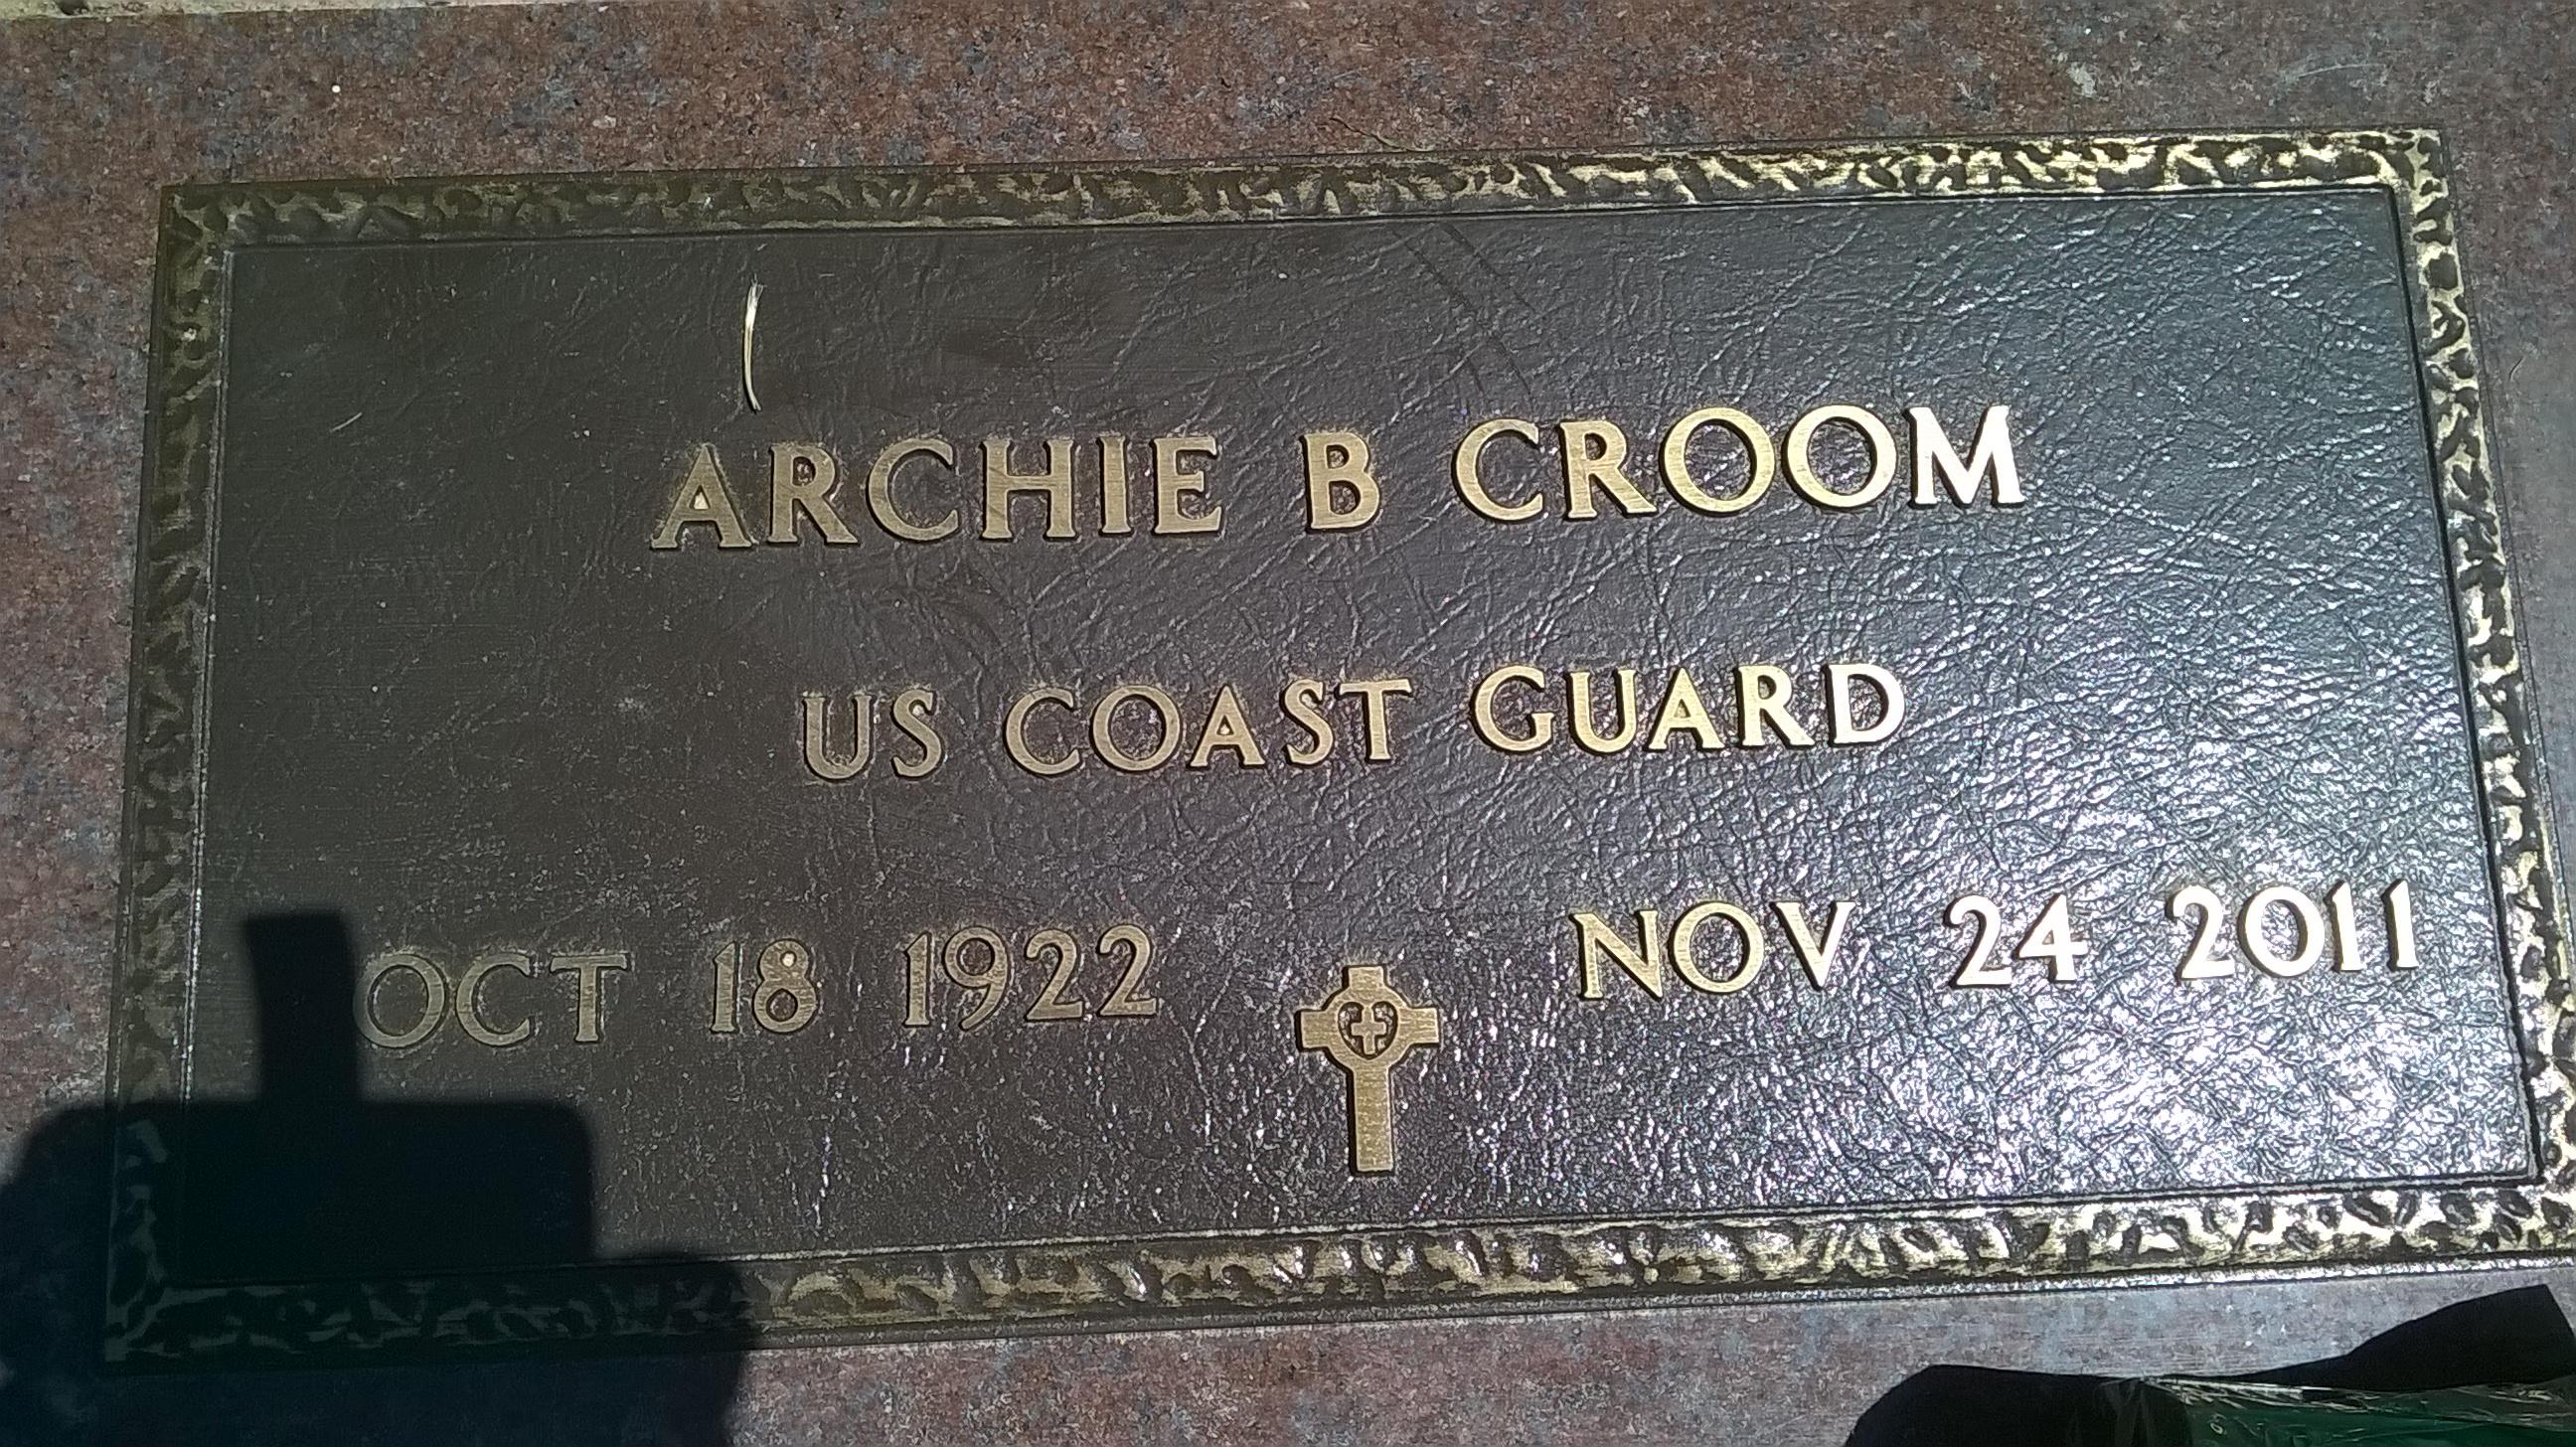 Capt Archie Birmingham Croom Find A Grave Memorial